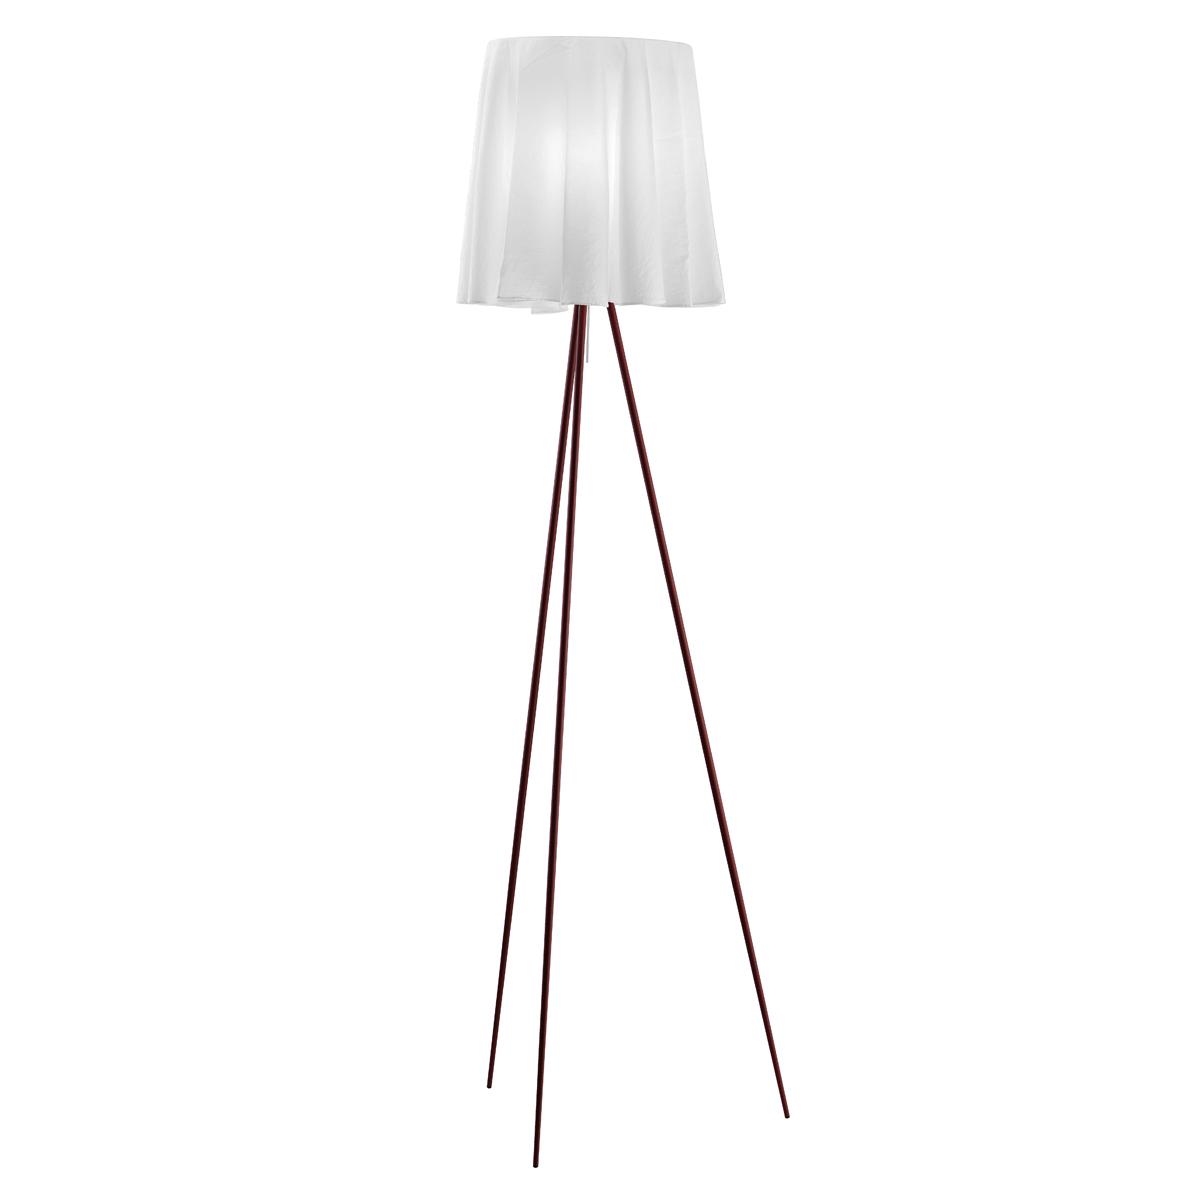 stehleuchte grau beautiful tobias grau stehleuchte louise with stehleuchte grau great. Black Bedroom Furniture Sets. Home Design Ideas